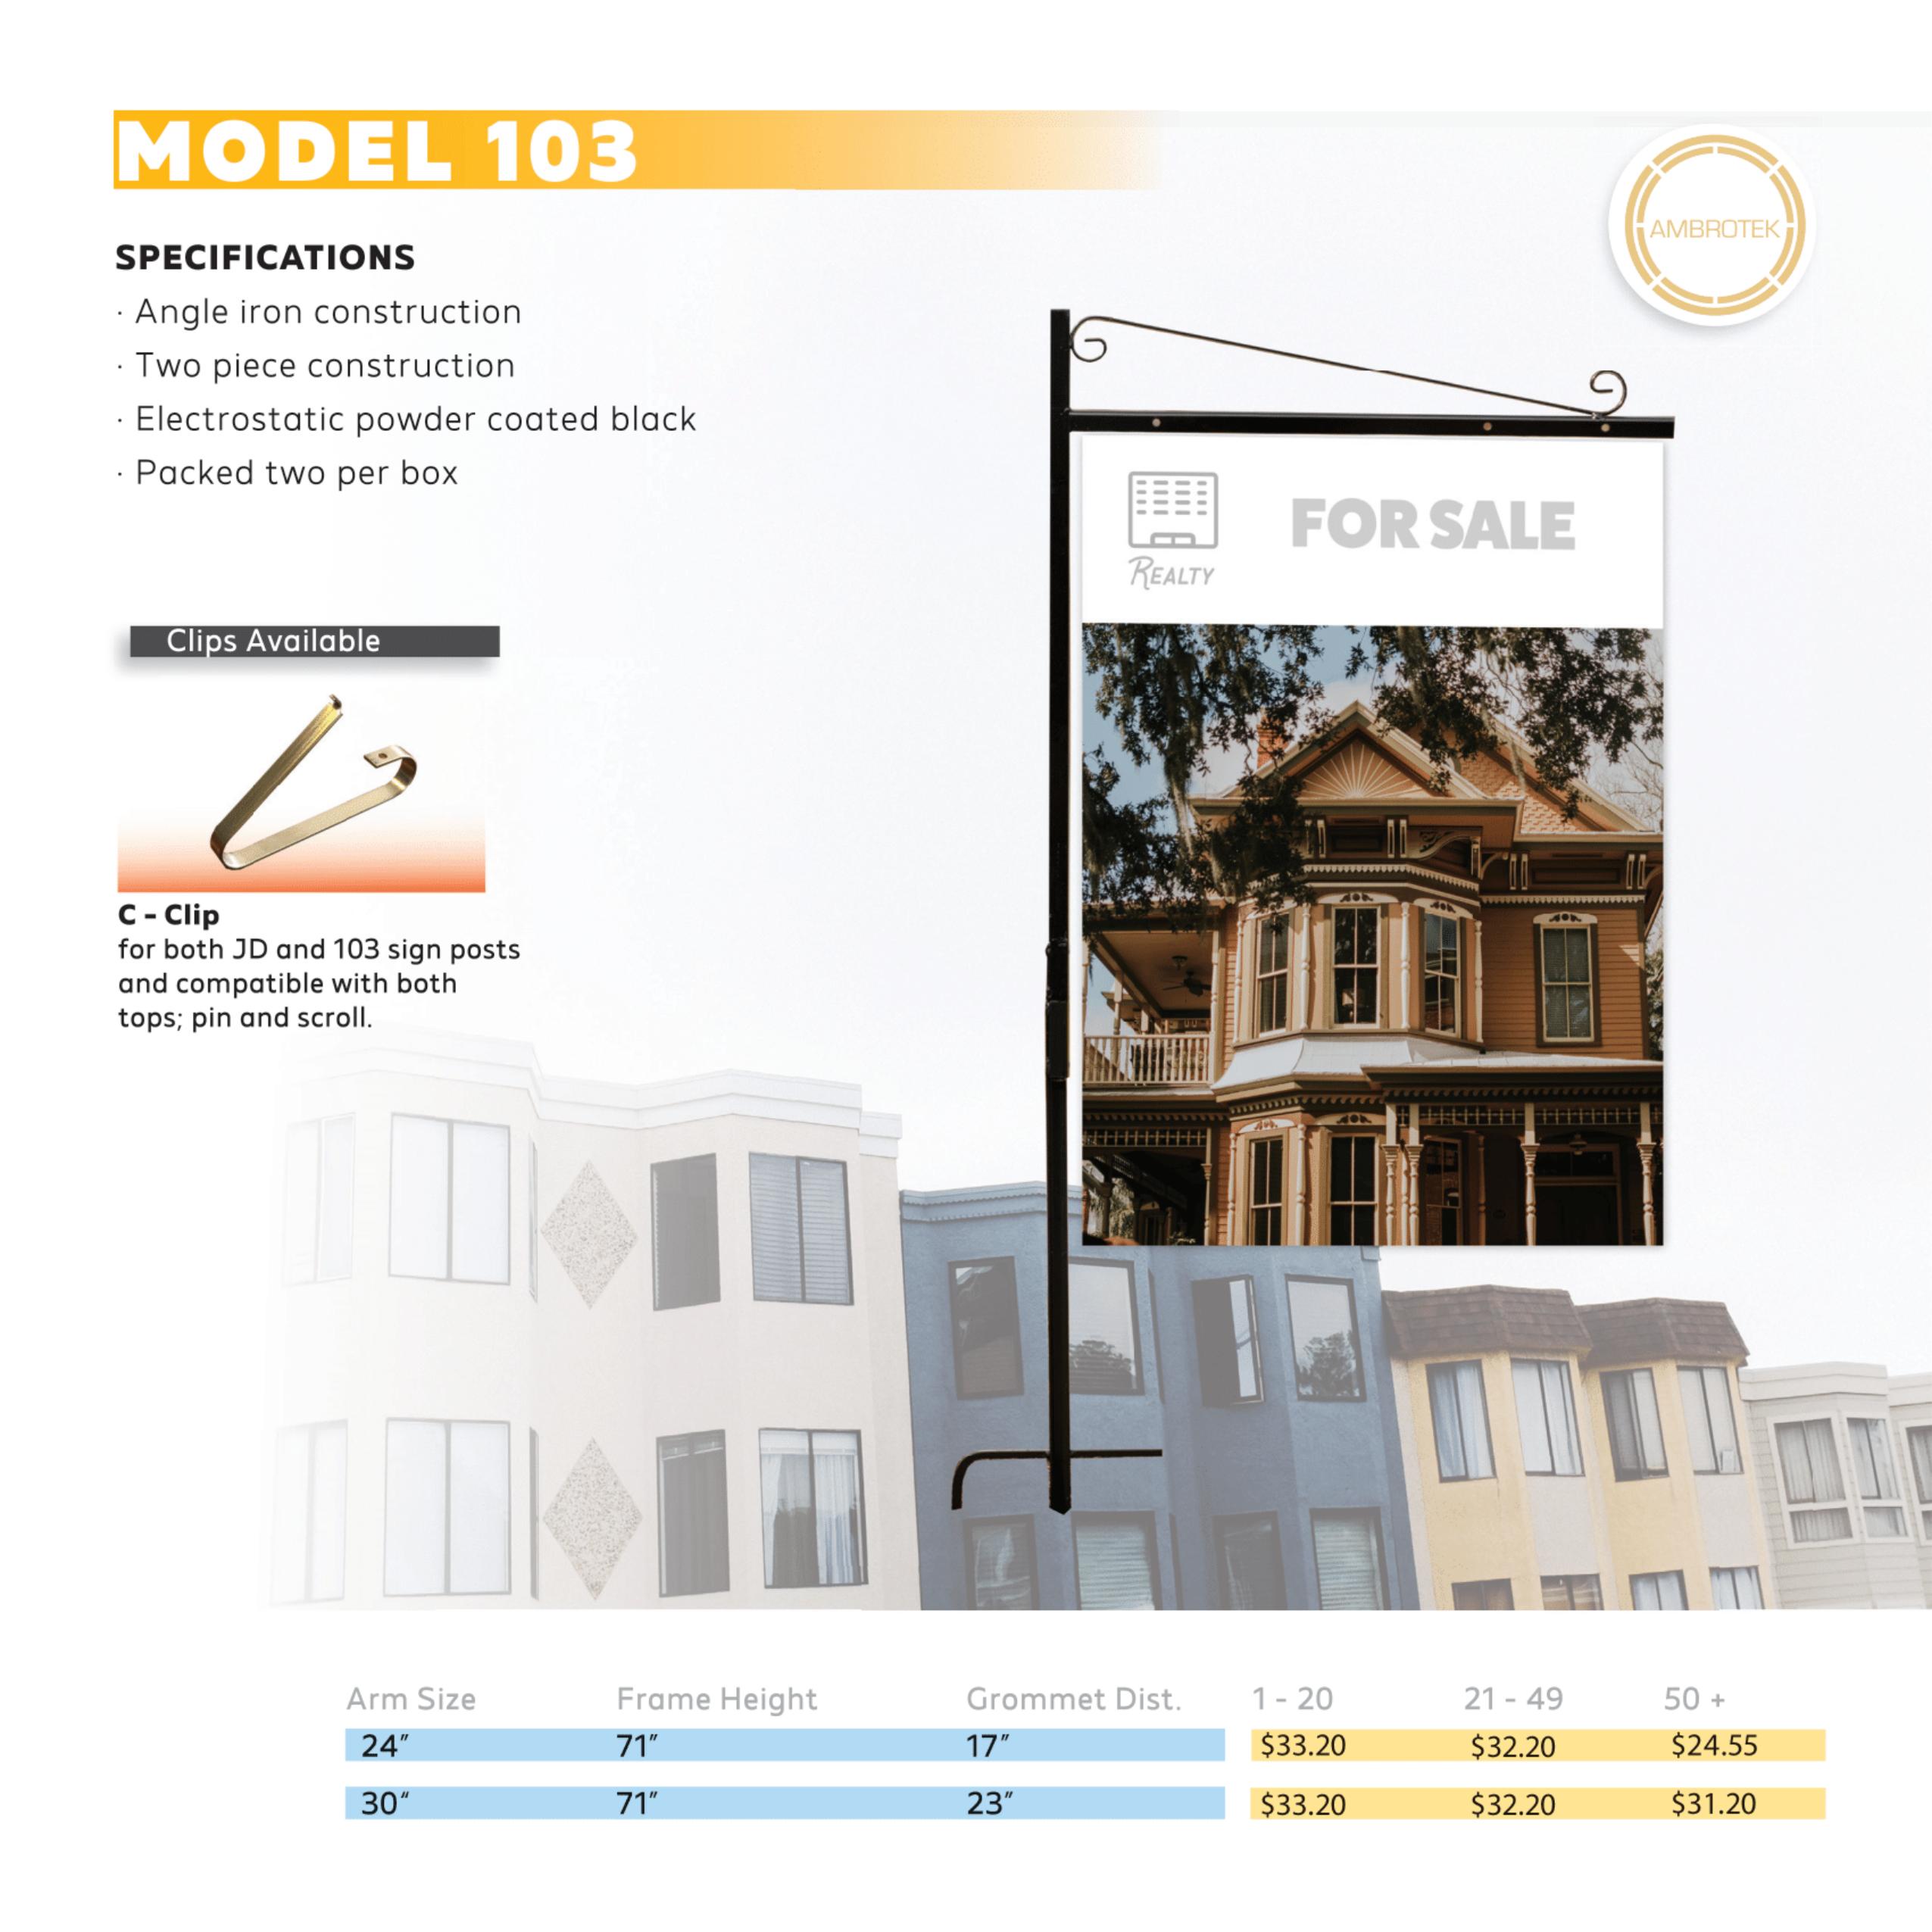 Model 103